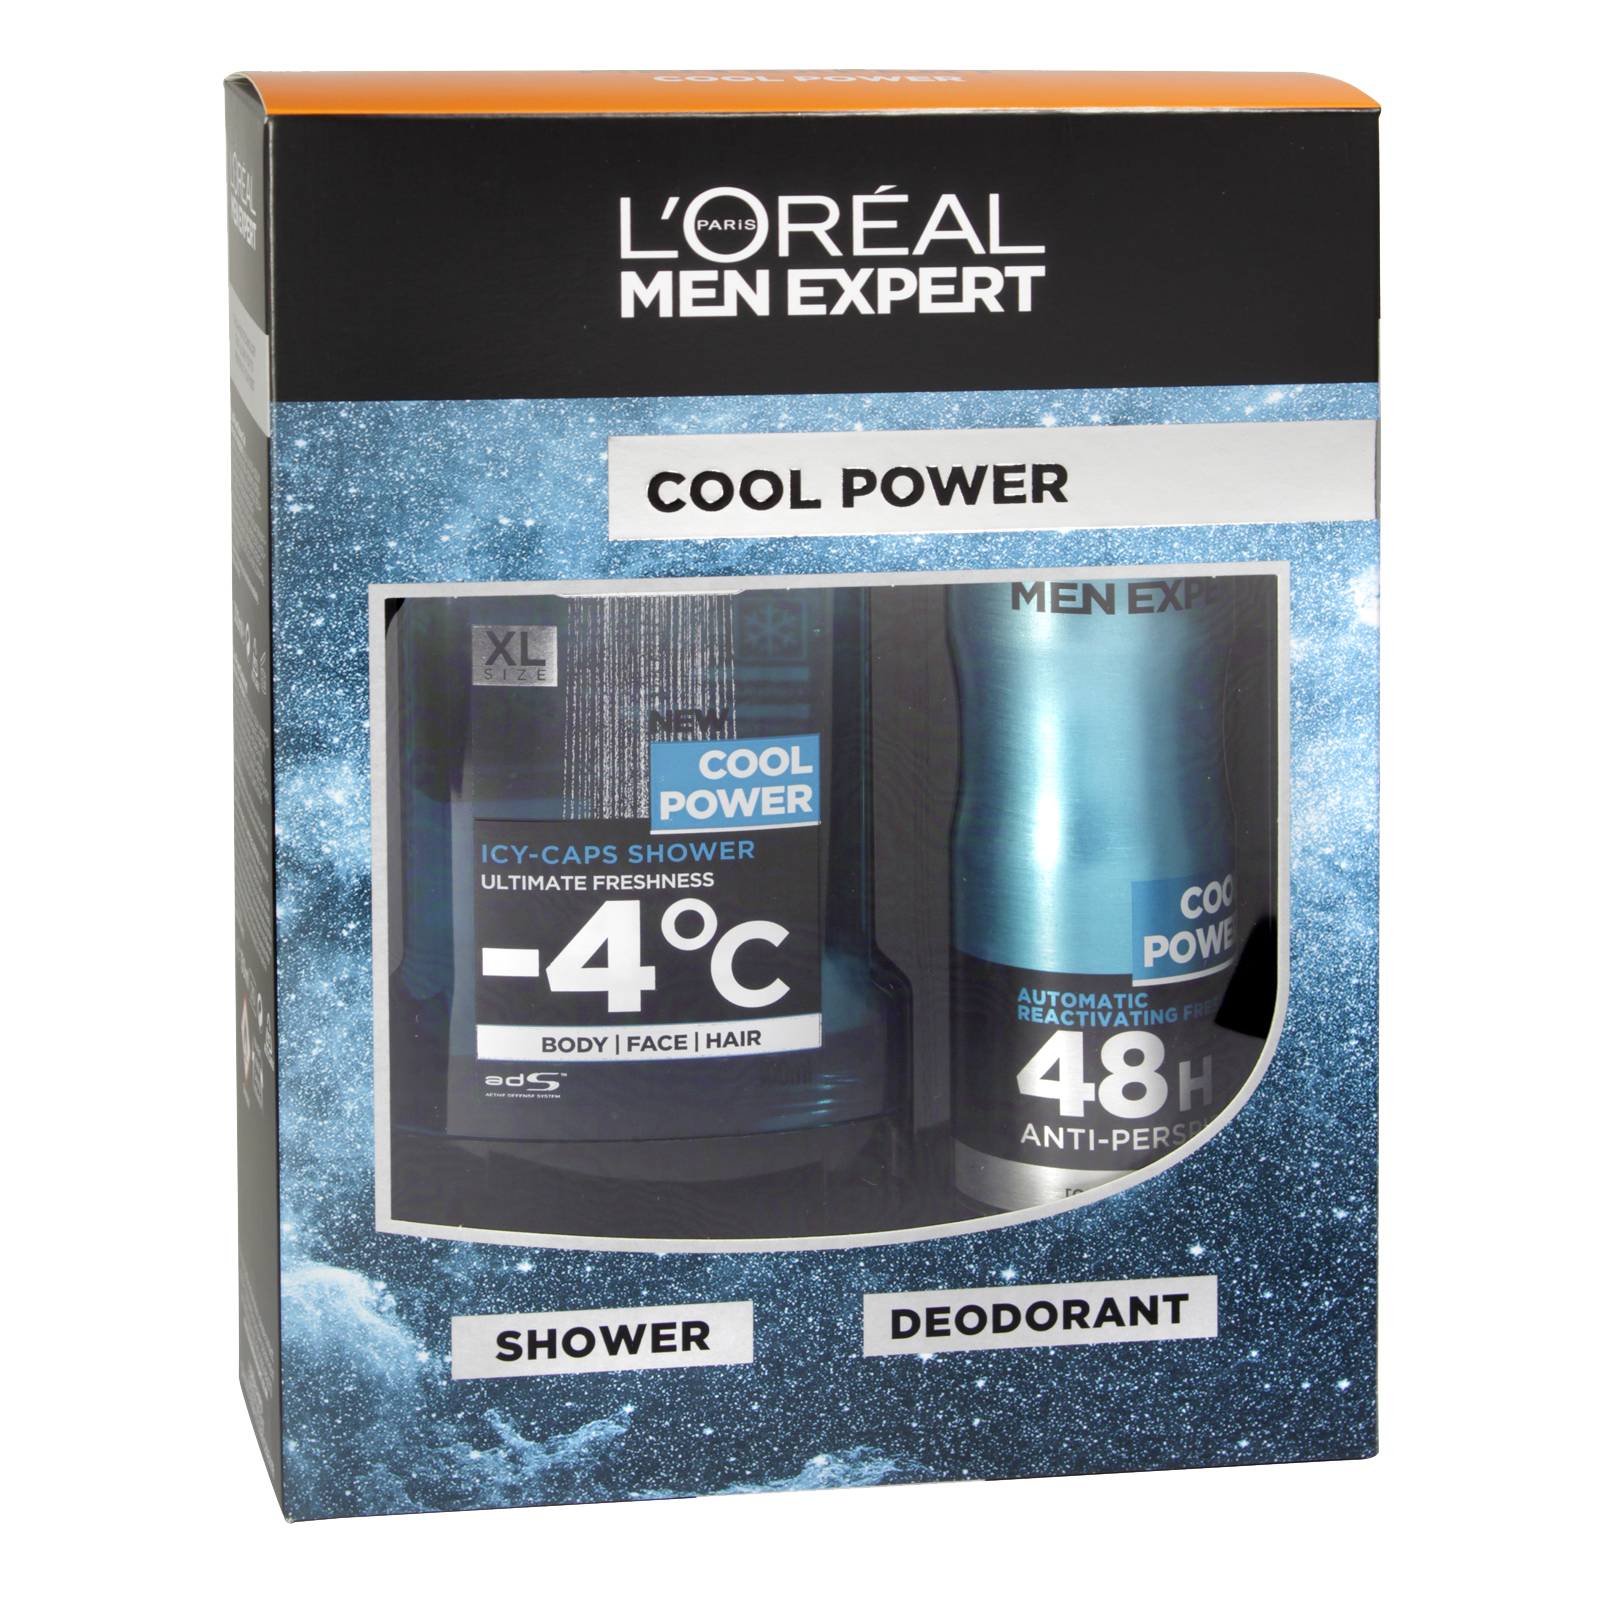 LOREAL MEN EXPERT 300ML SHOWER GEL+150ML DEOD COOL POWER